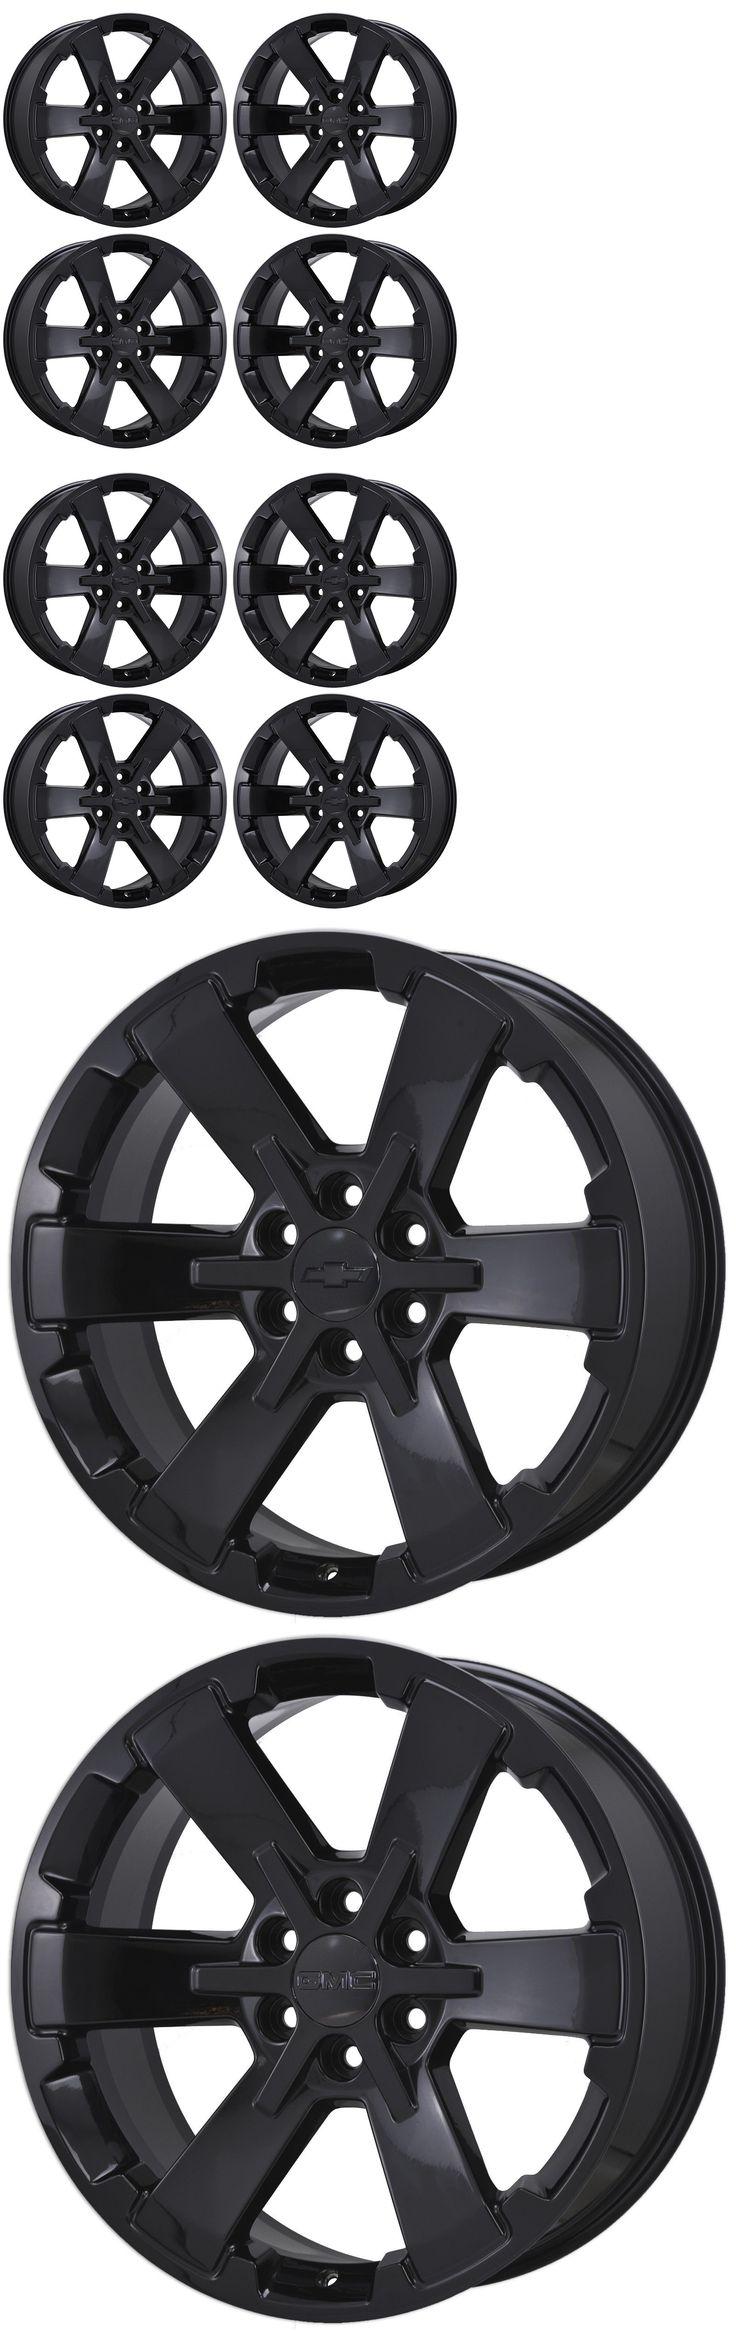 Auto parts general 22 gm sierra silverado 1500 black wheels rims factory oem set